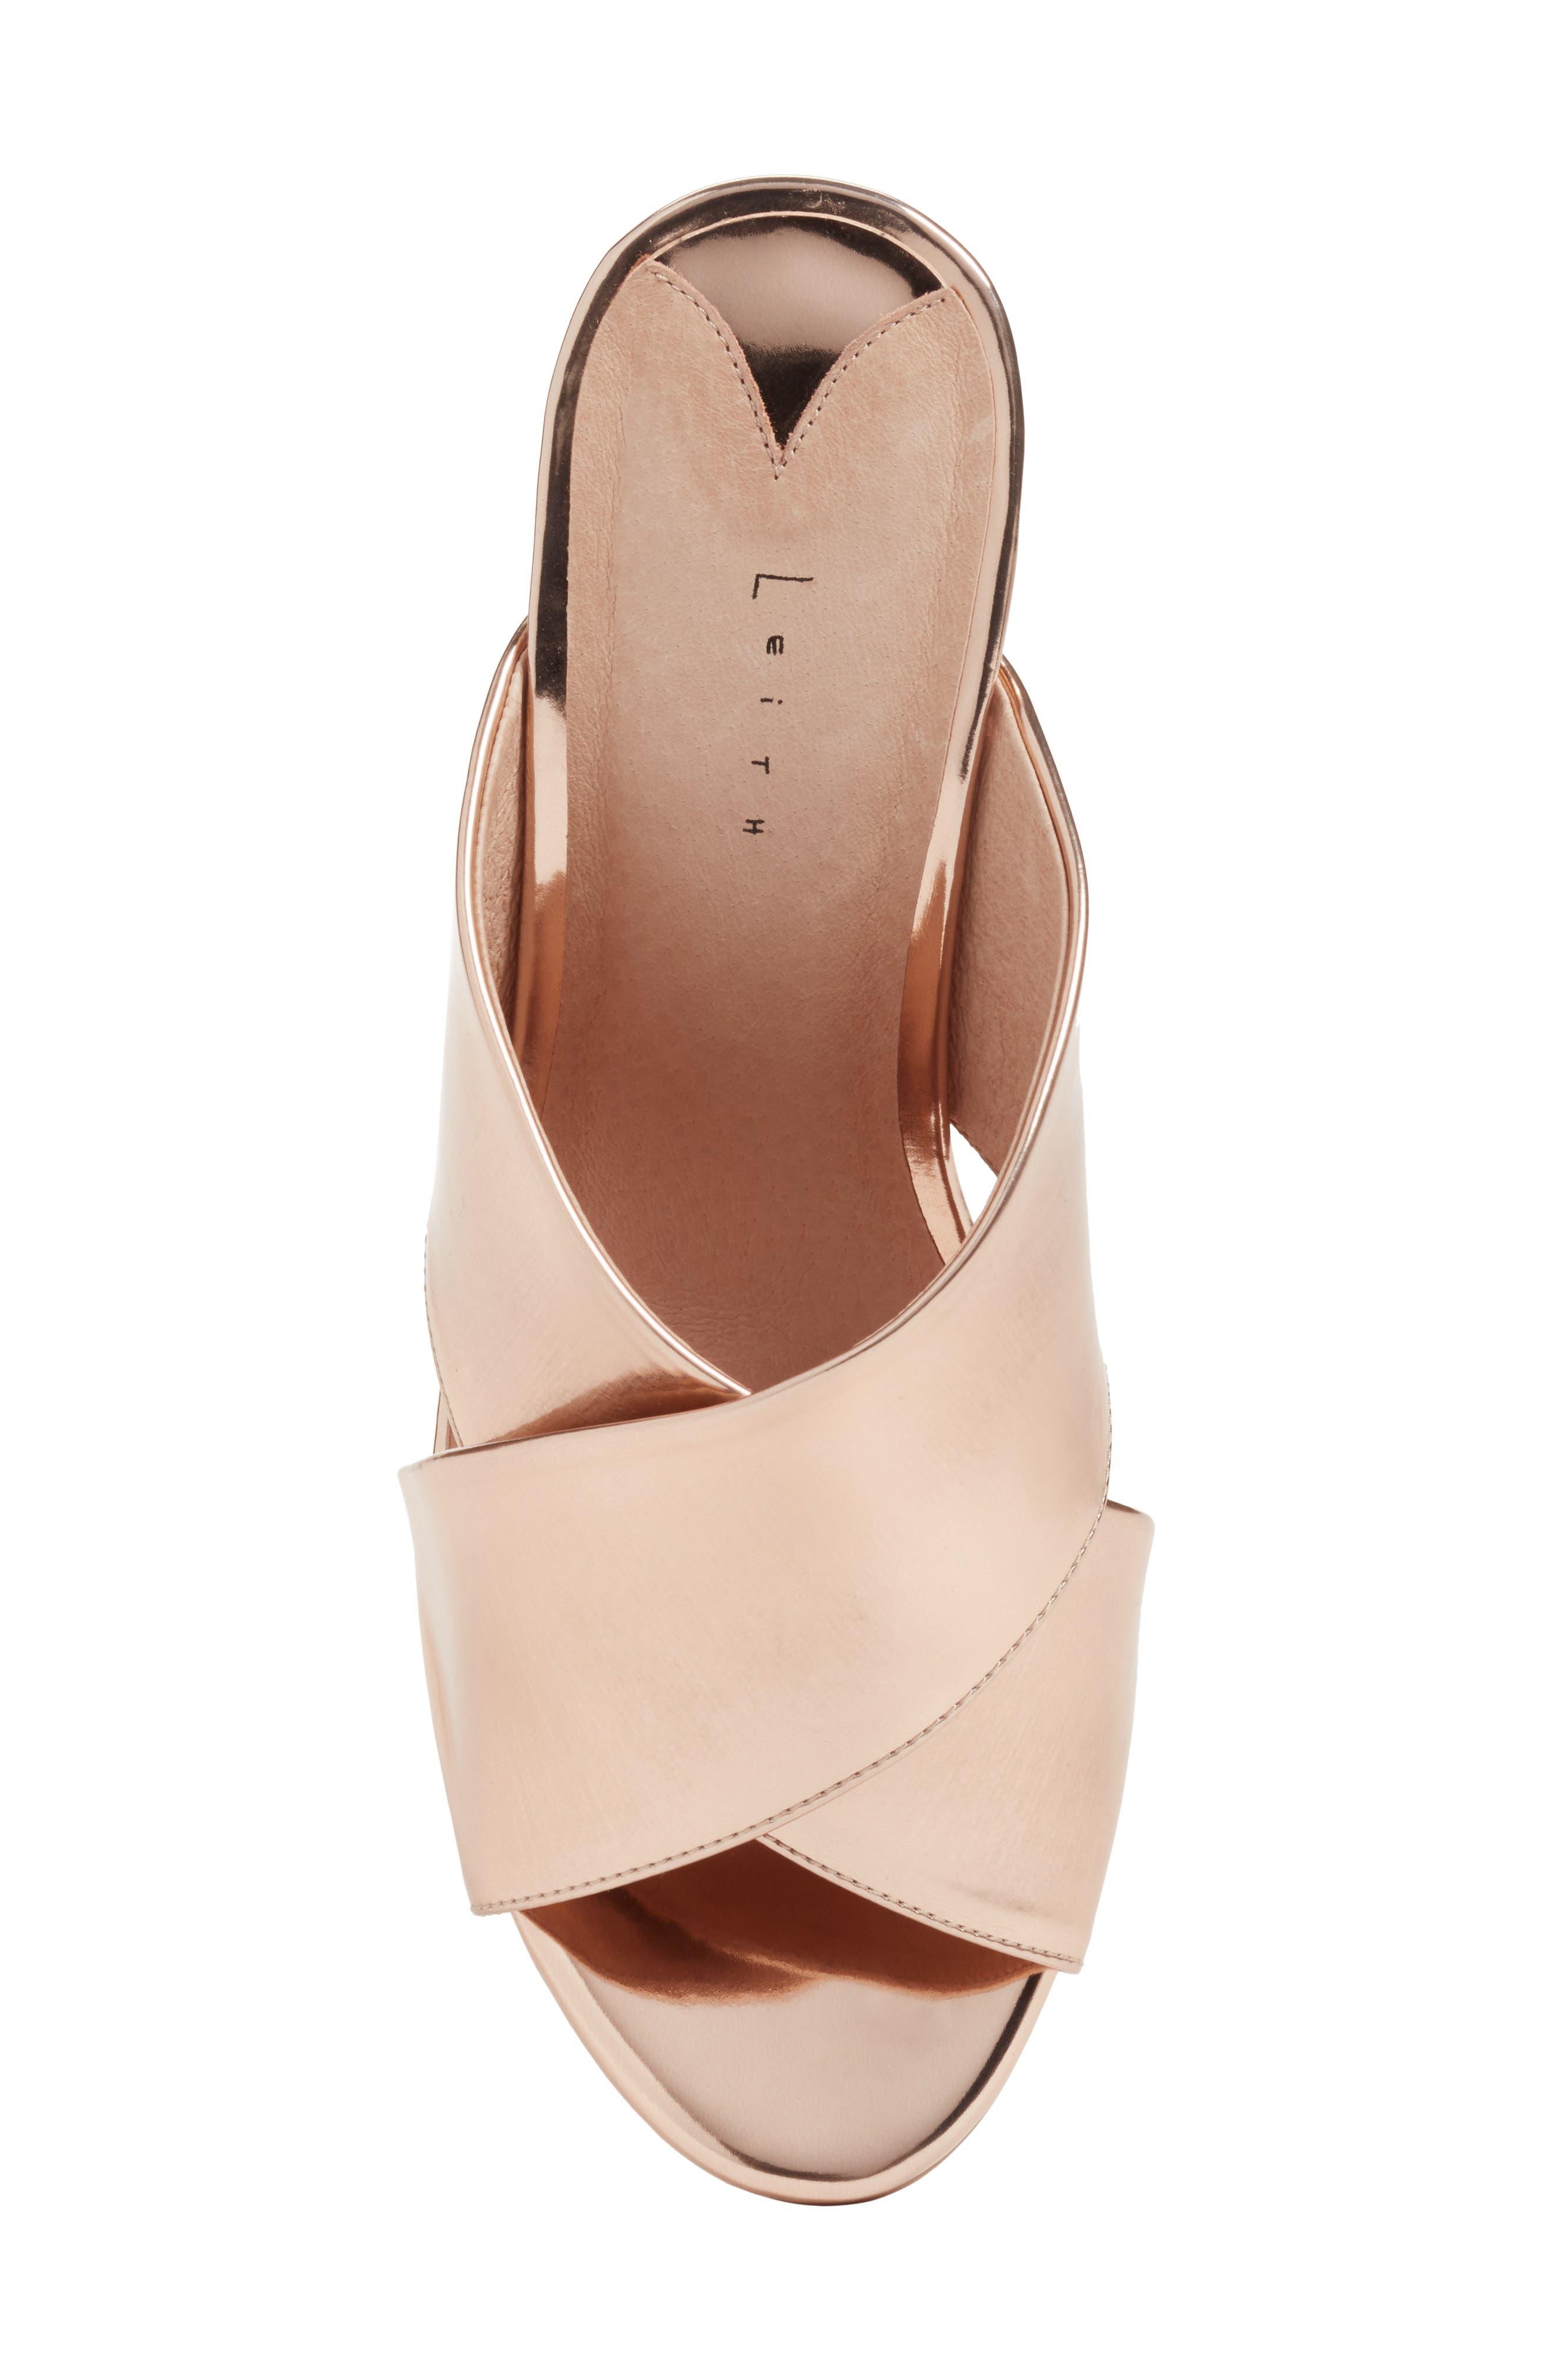 Cammie Block Heel Sandal,                             Alternate thumbnail 6, color,                             659